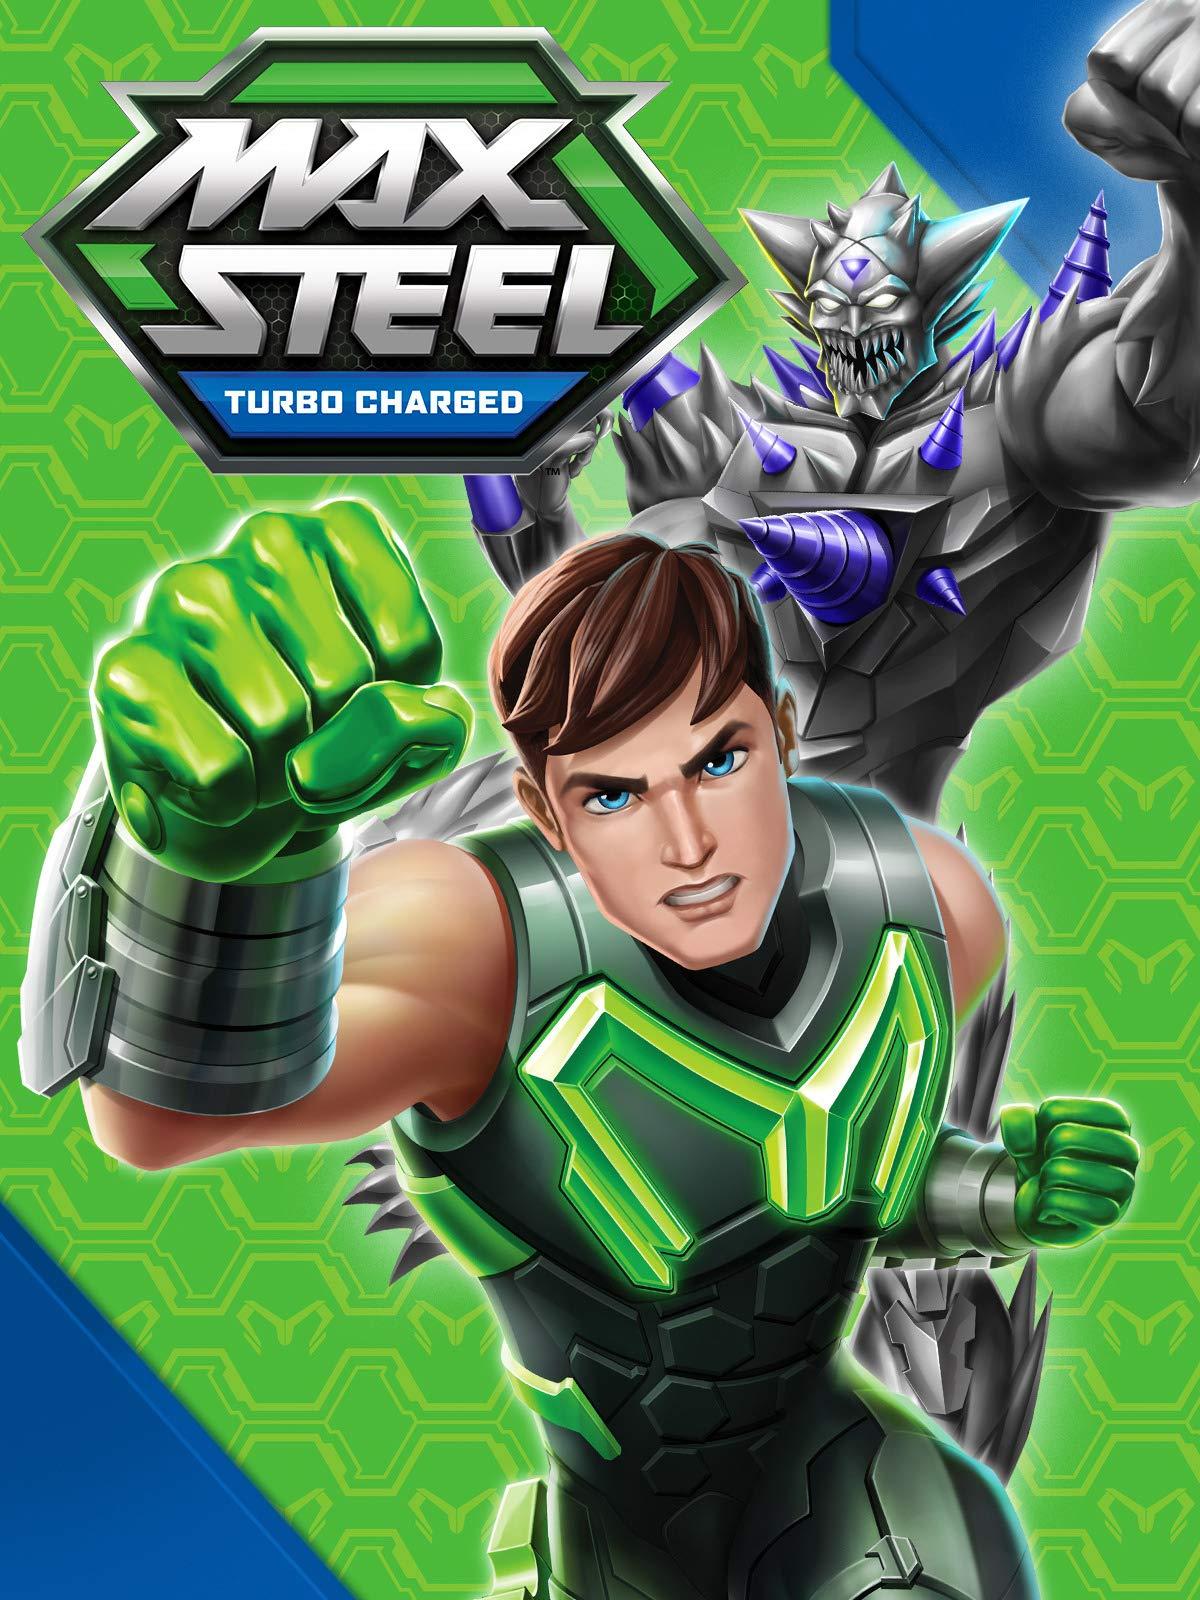 Max Steel Turbo Charged on Amazon Prime Video UK